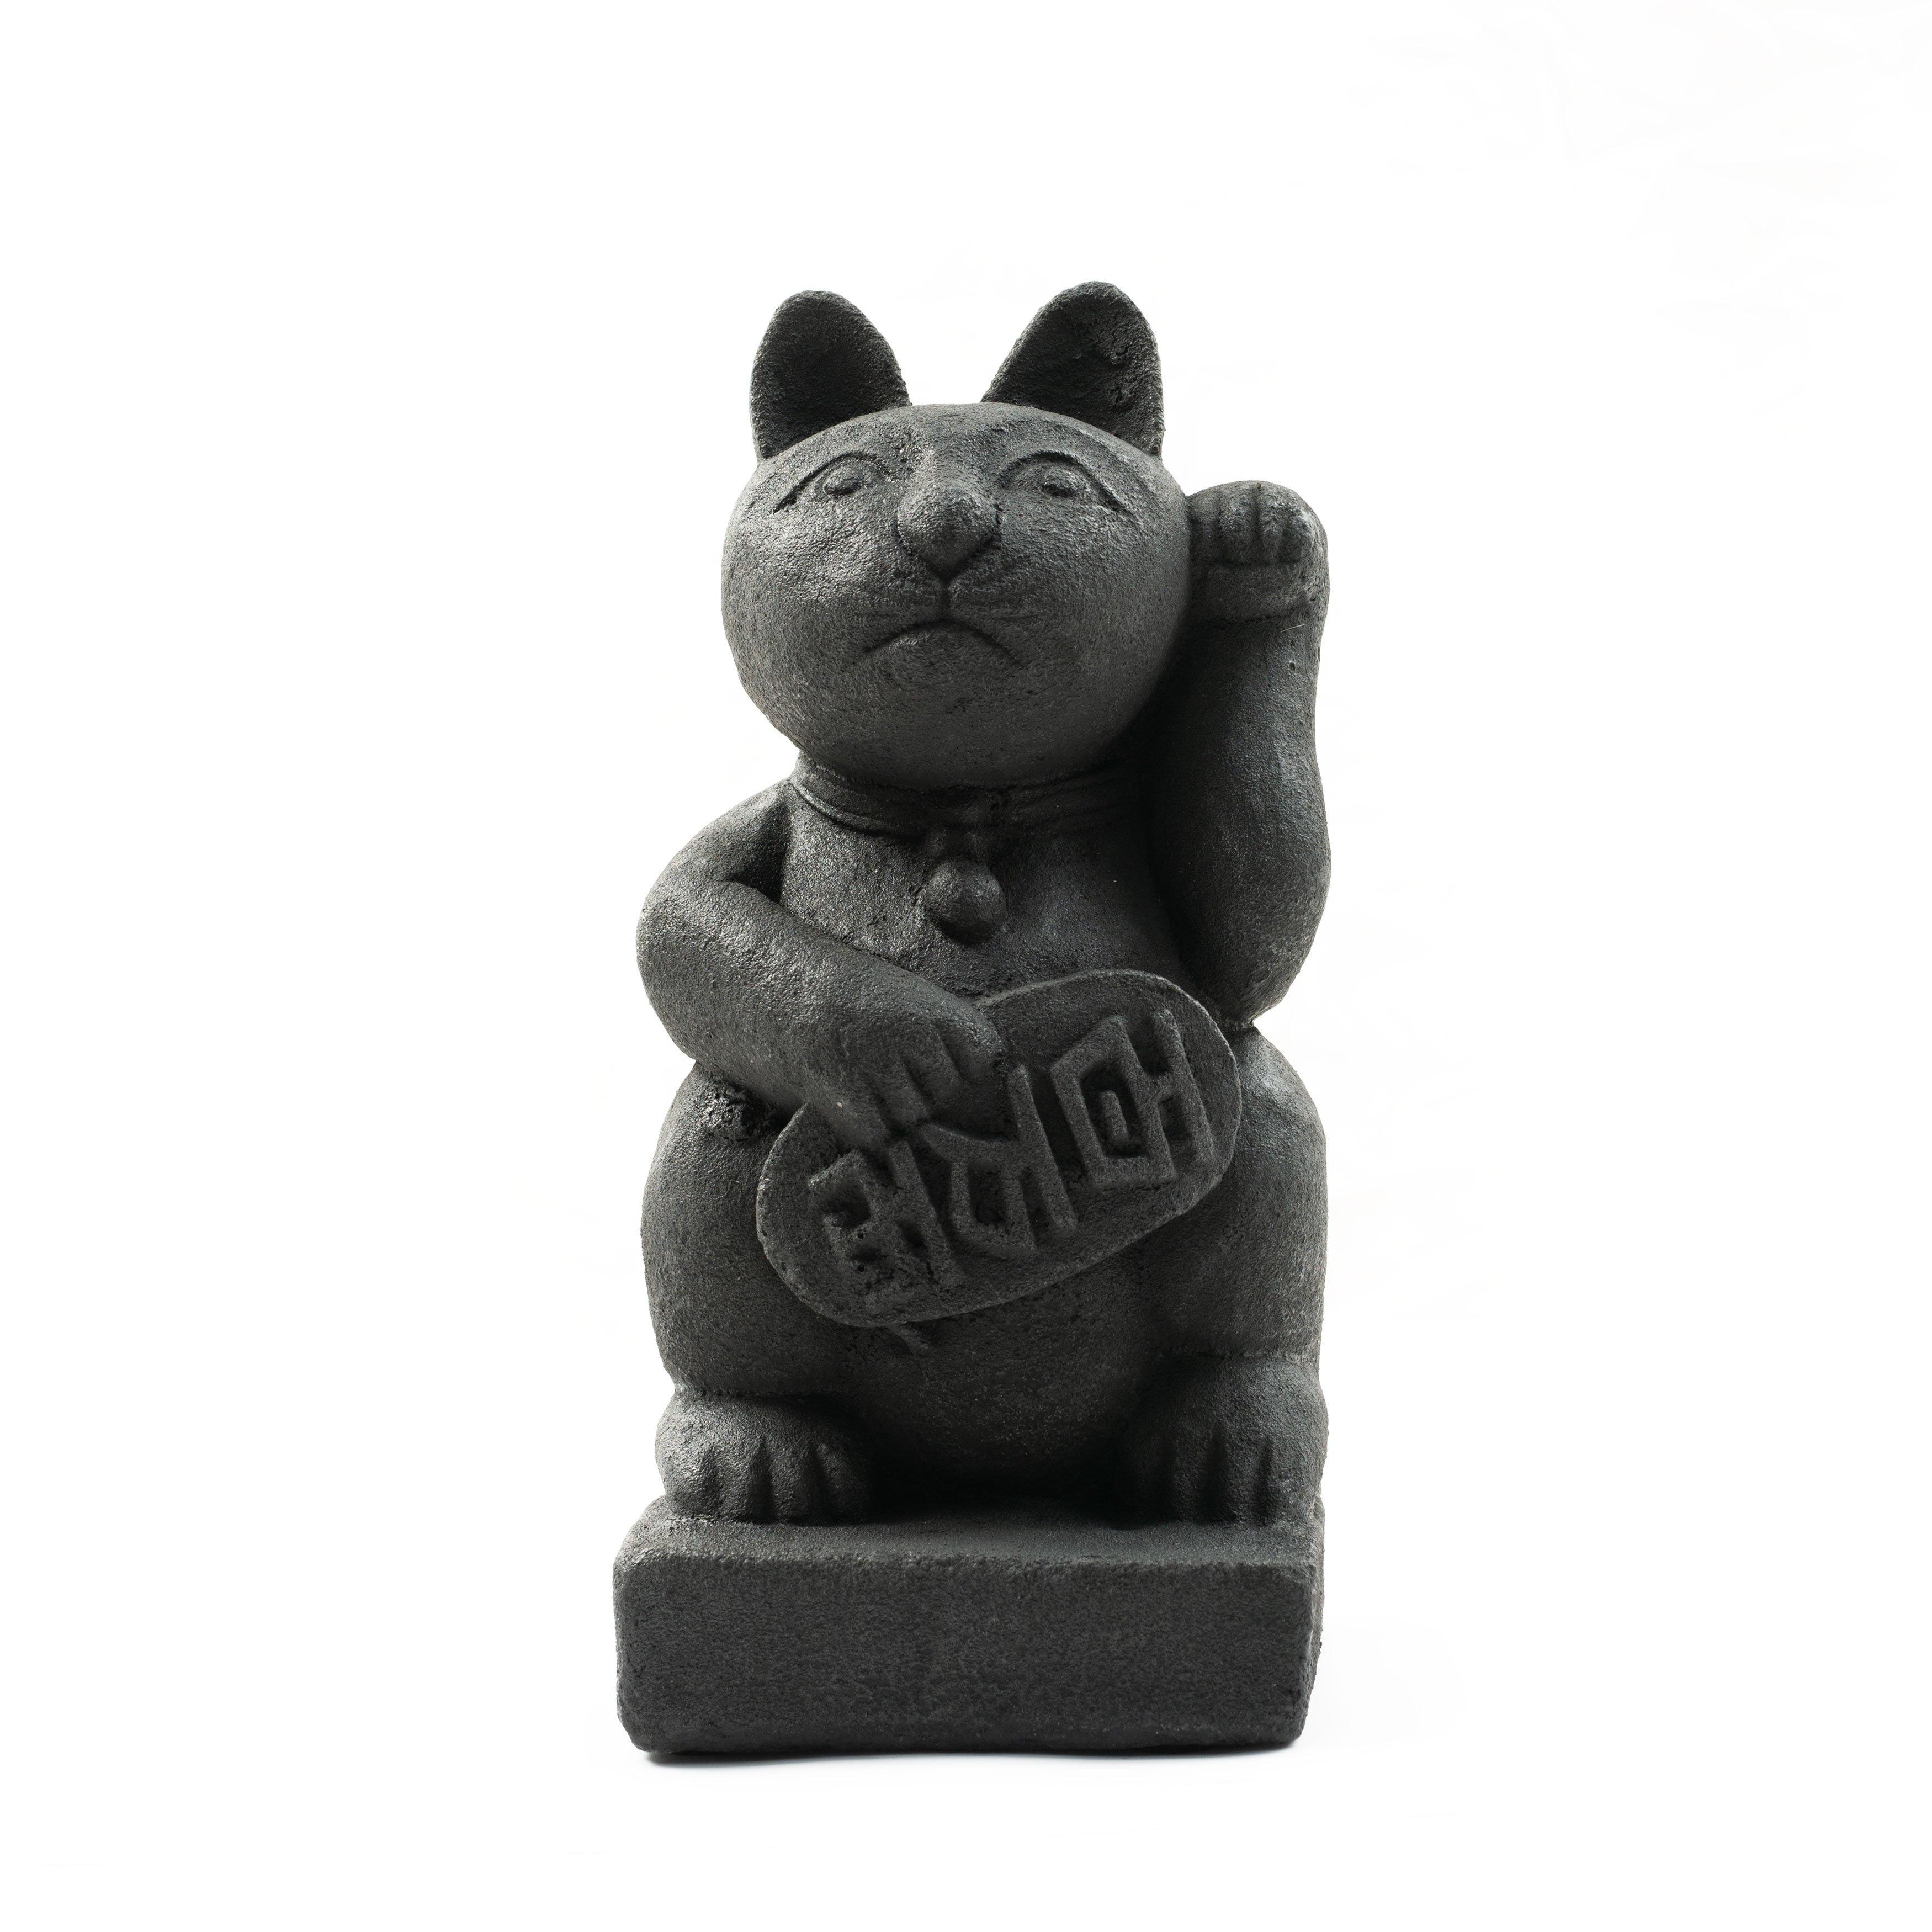 f9582bce6 Shop Handmade Stone Japanese Maneki Neko 'Lucky Cat' Statue - On ...